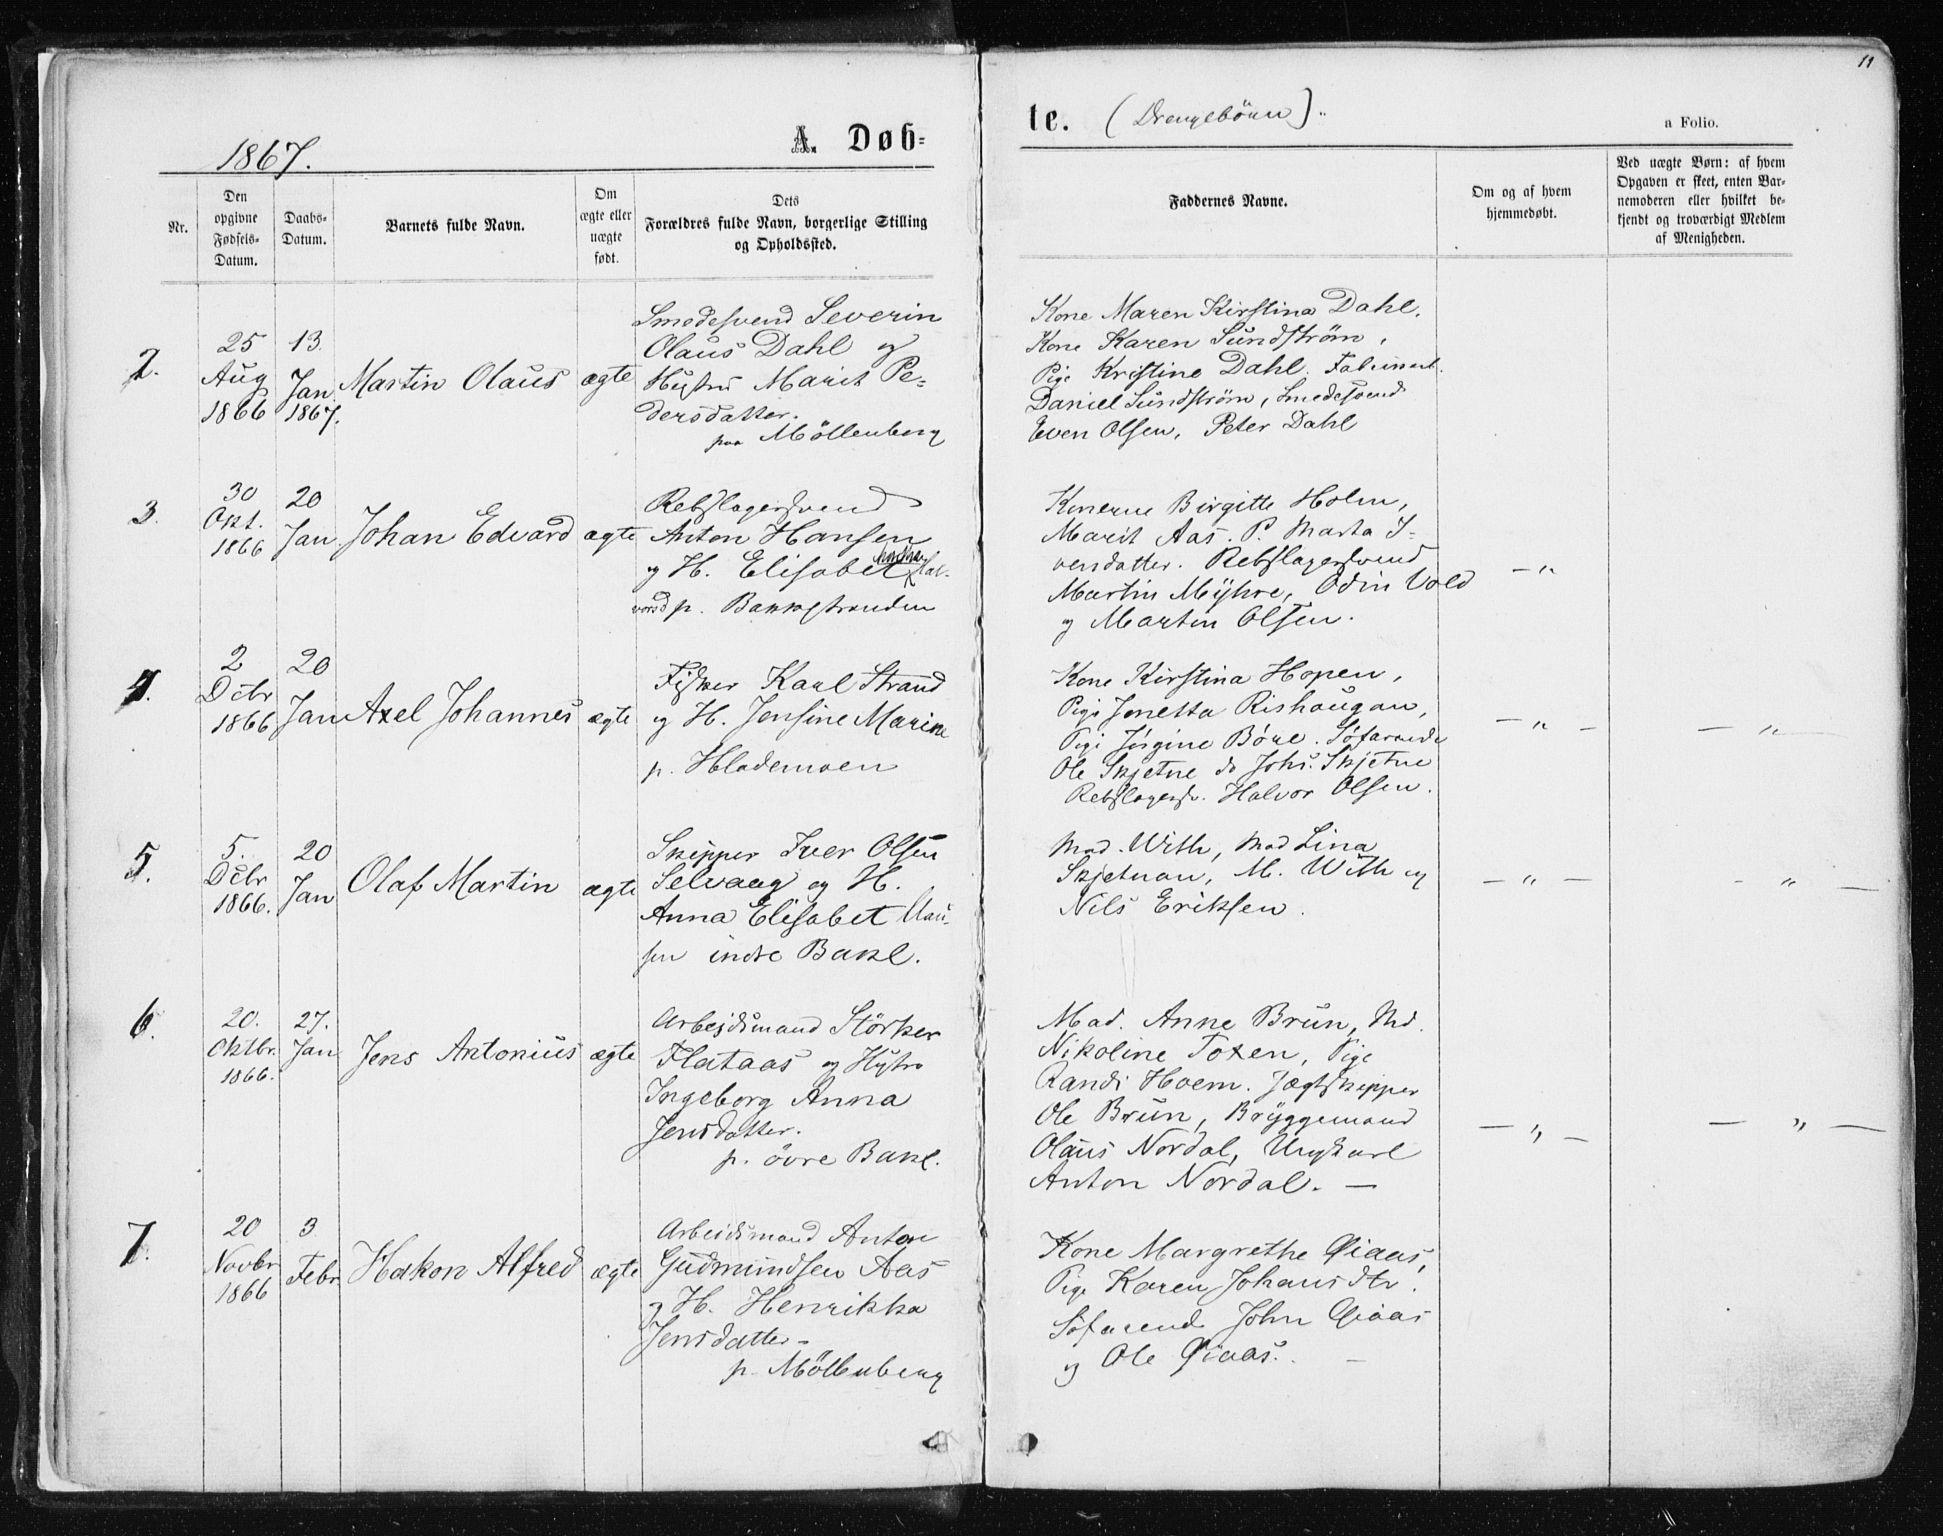 SAT, Ministerialprotokoller, klokkerbøker og fødselsregistre - Sør-Trøndelag, 604/L0186: Parish register (official) no. 604A07, 1866-1877, p. 11